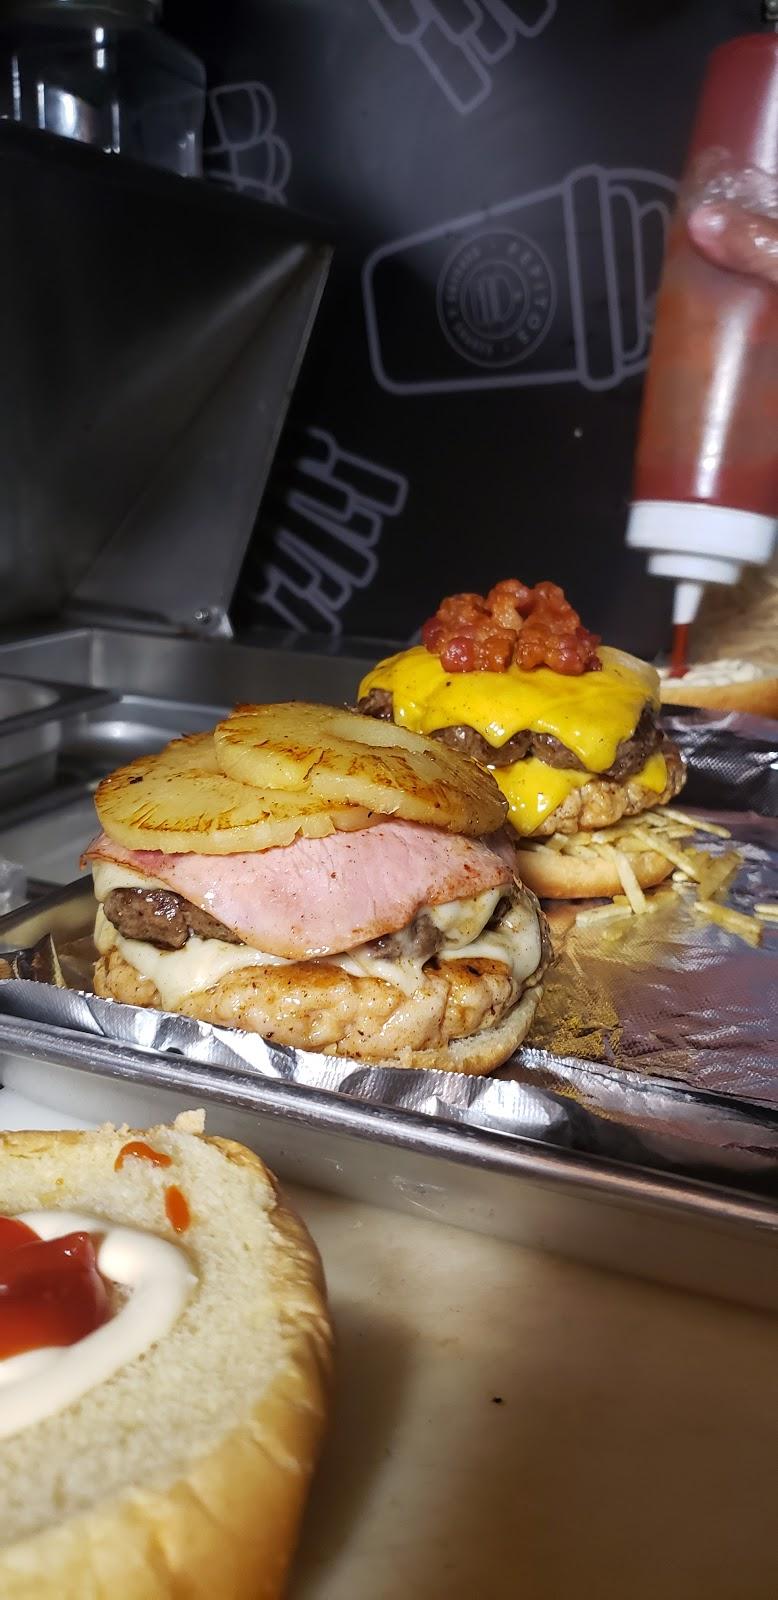 Pepitos Burgers & Shakes | restaurant | 2590 NE 186th St, North Miami Beach, FL 33160, USA | 3054143521 OR +1 305-414-3521